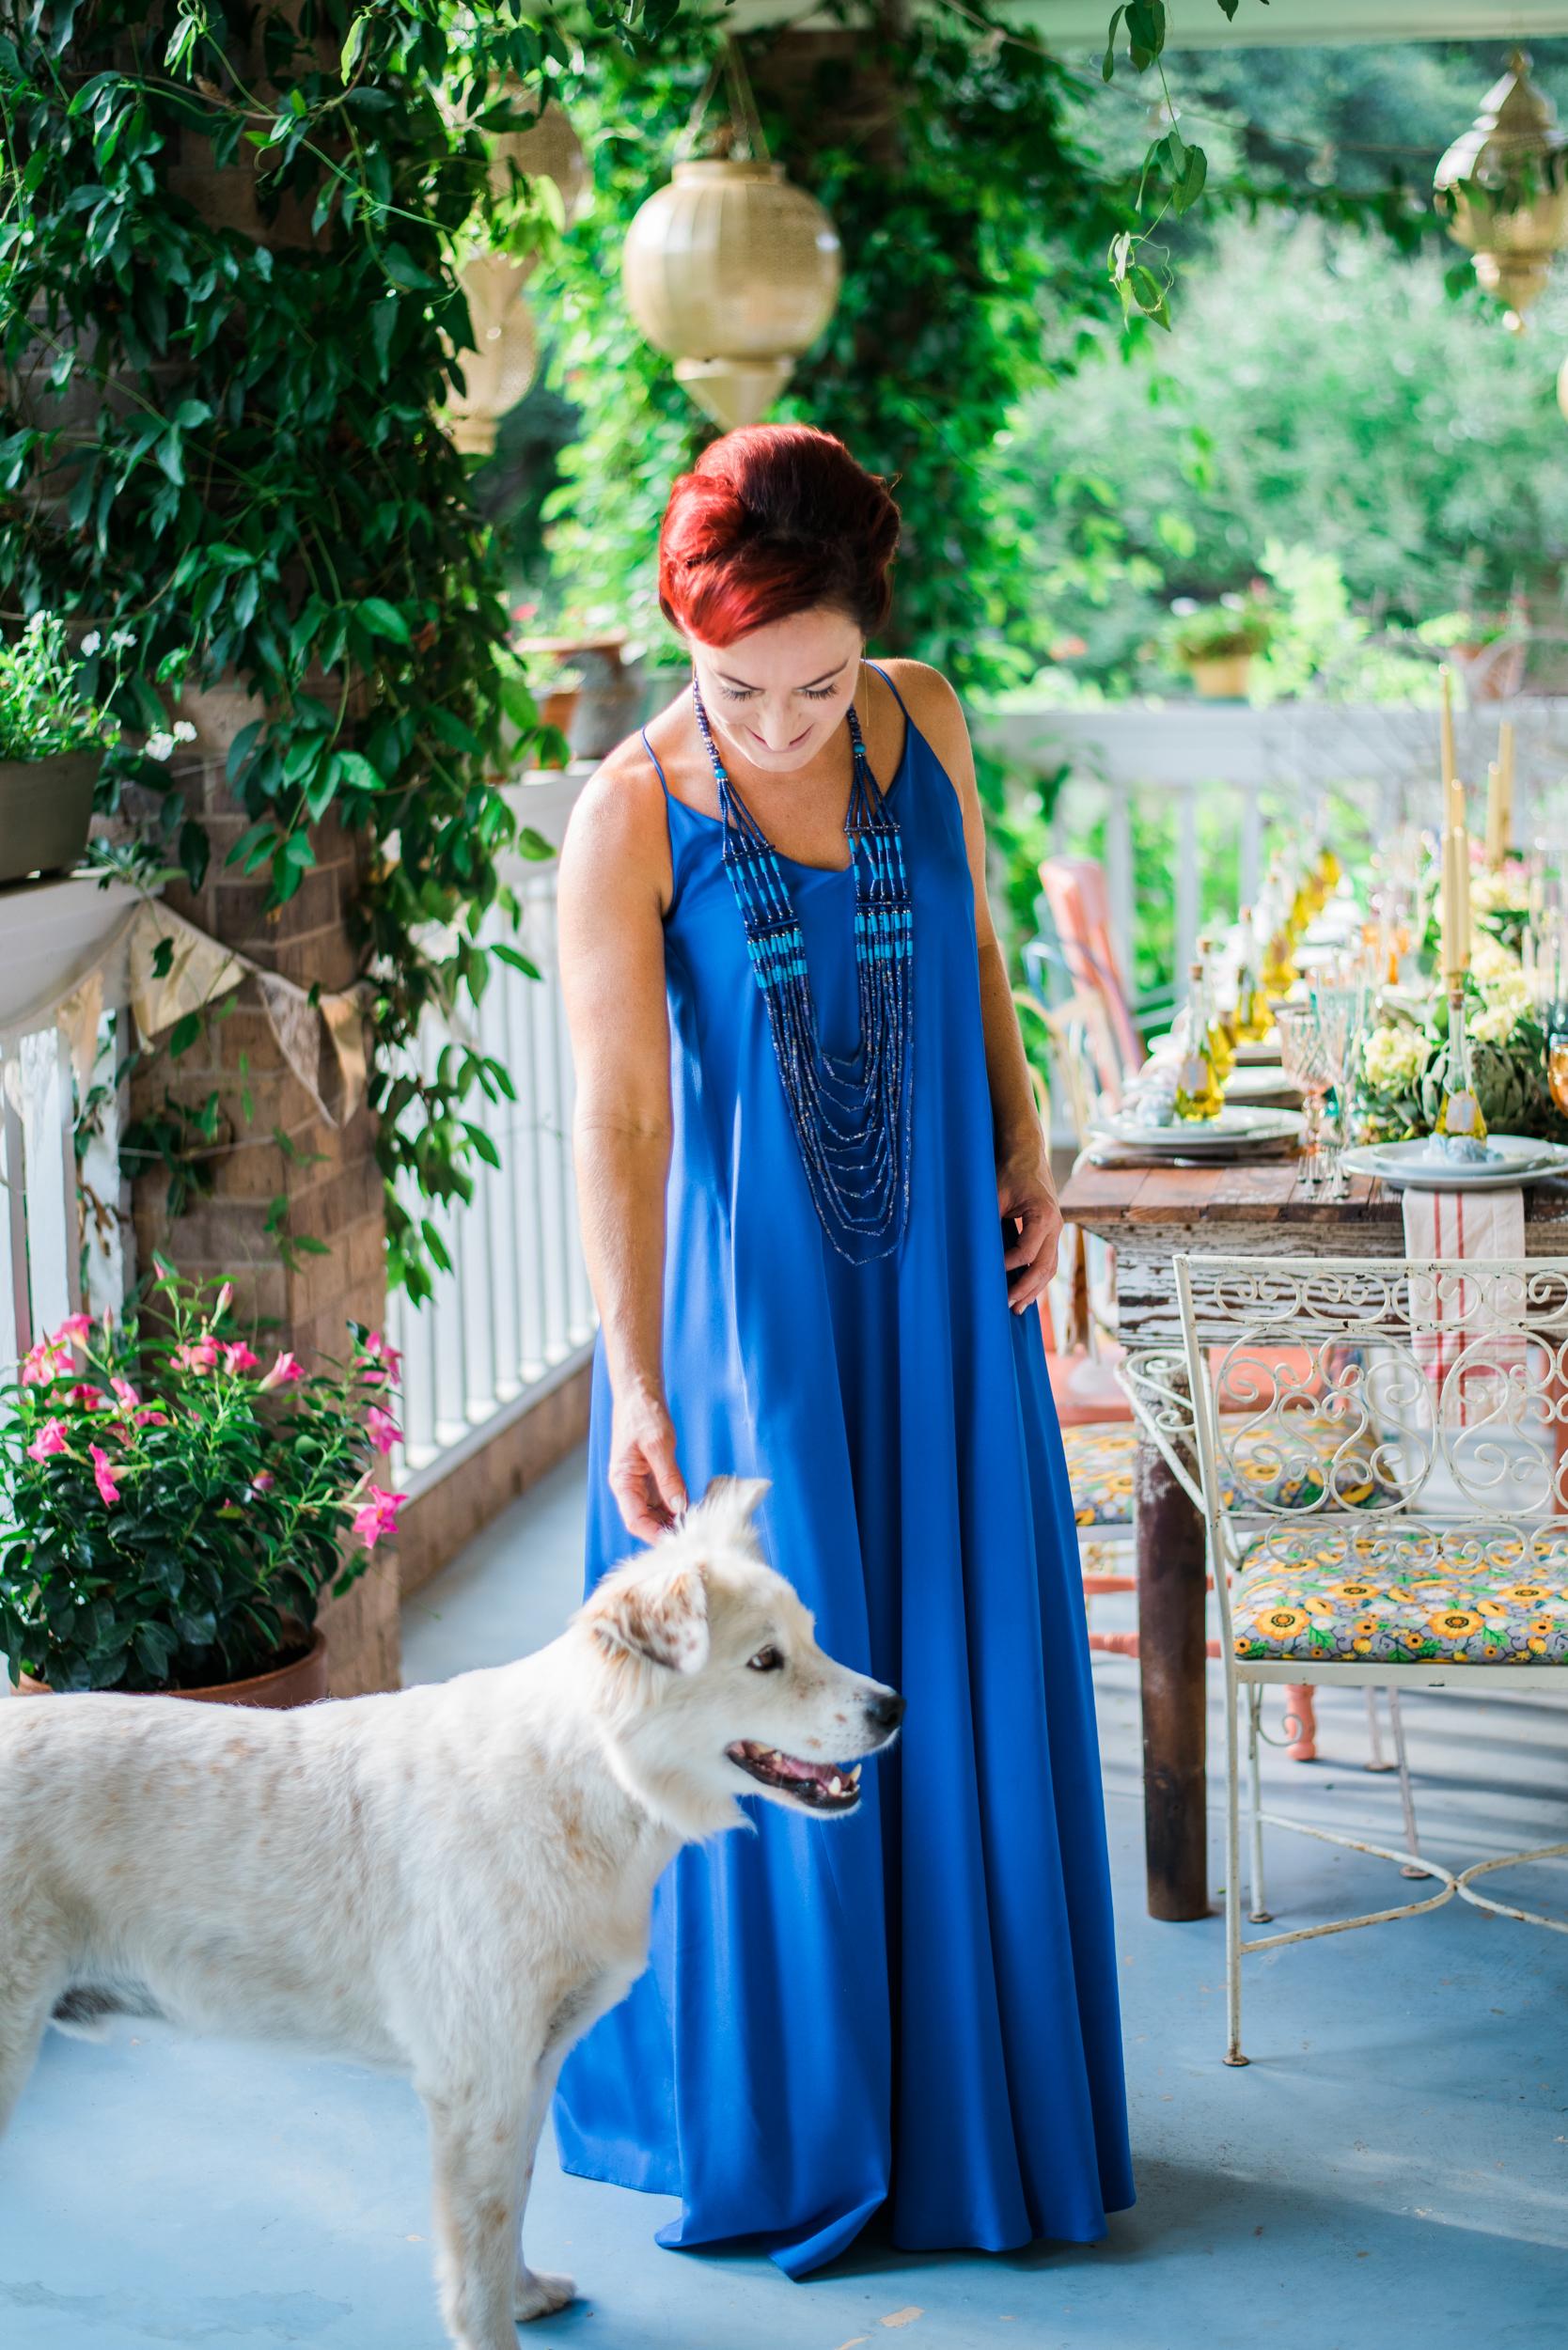 SophiesSecondAnnualJuneFestoon-PhotoByKatrinaBarber-9562.jpg